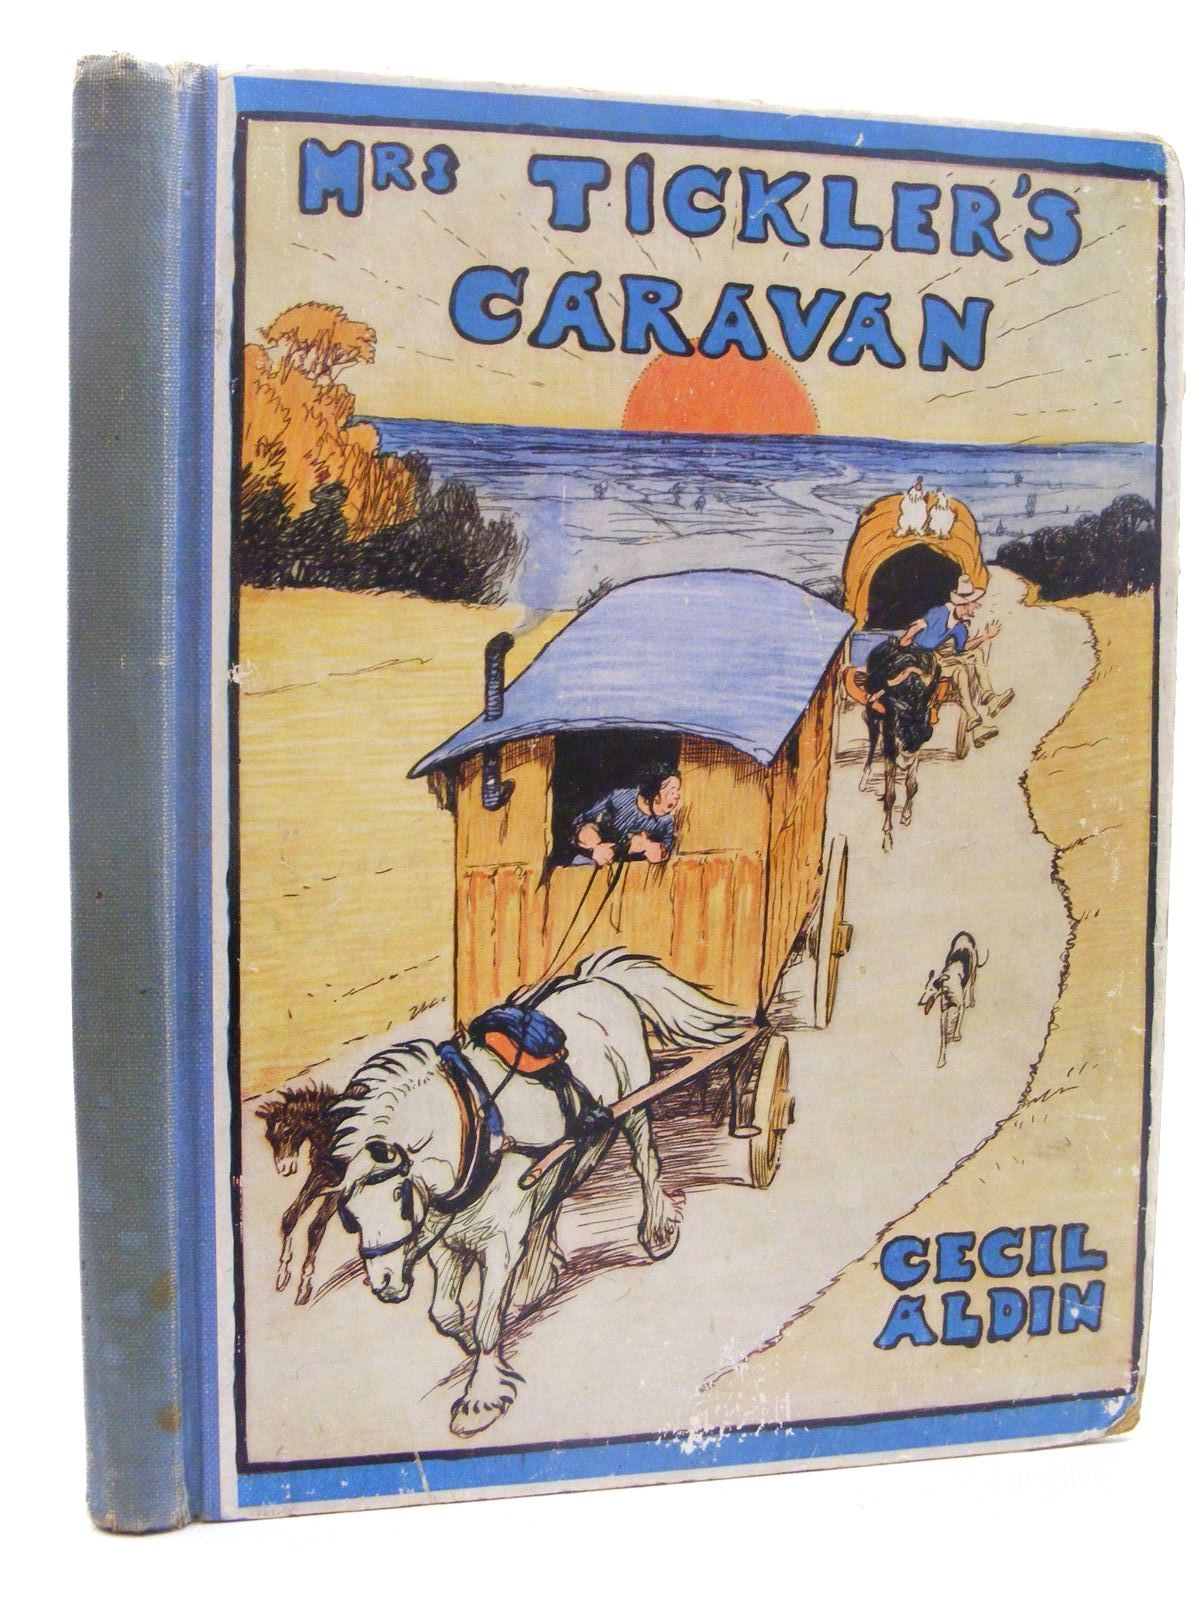 Photo of MRS. TICKLER'S CARAVAN A STORY FOR CHILDREN- Stock Number: 2124912